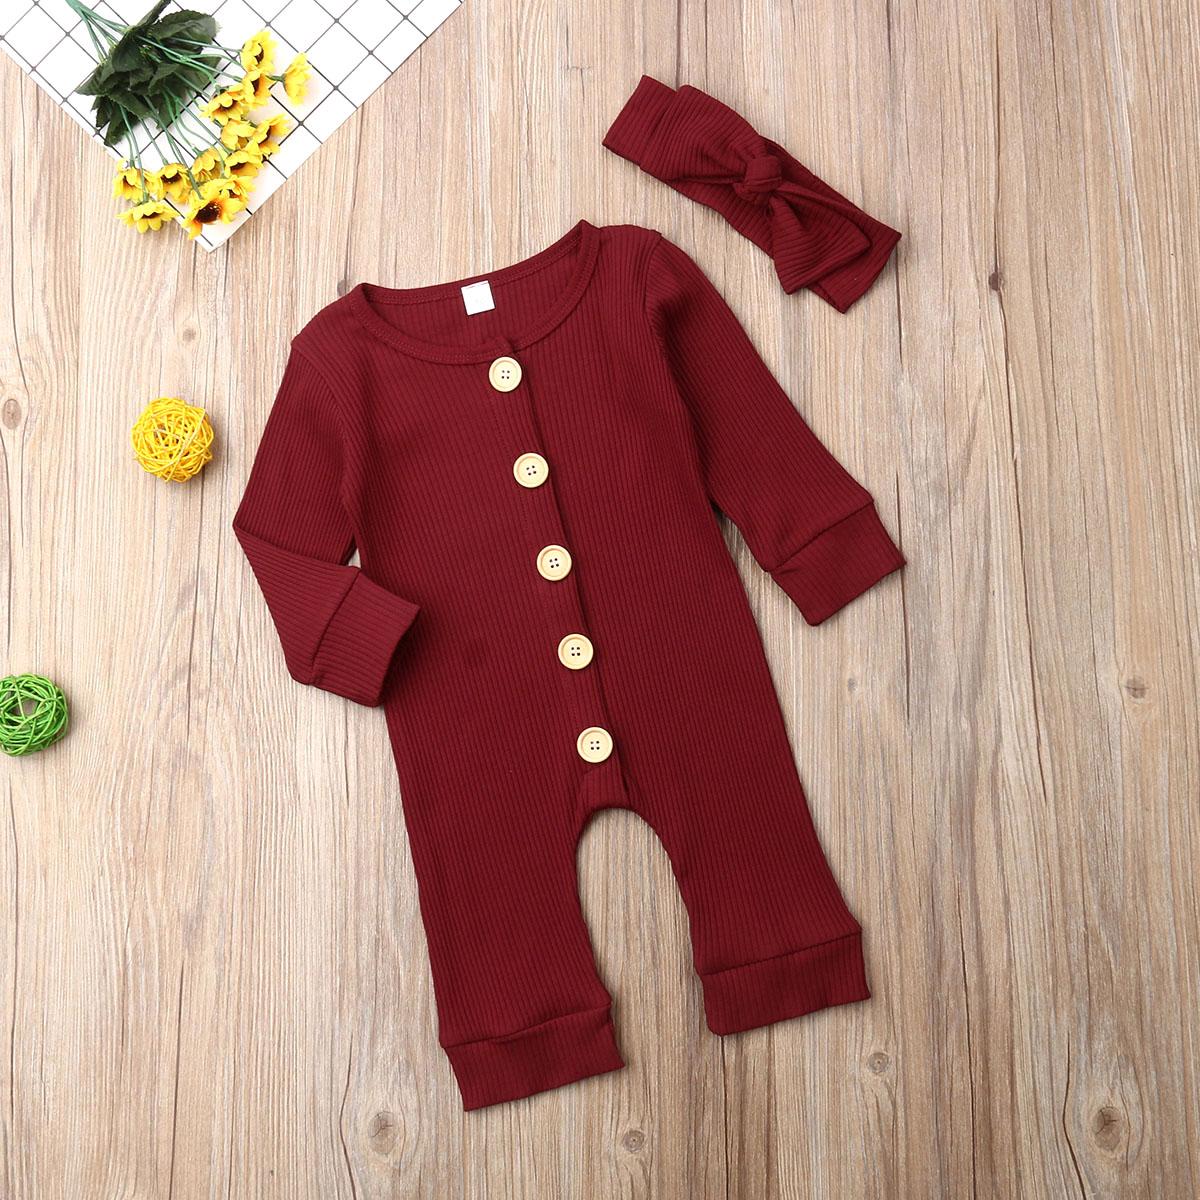 Ha316183721474d2580b7bb847027b81di Spring Fall Newborn Baby Girl Boy Clothes Long Sleeve Knitted Romper + Headband Jumpsuit 2PCS Outfit 0-24M